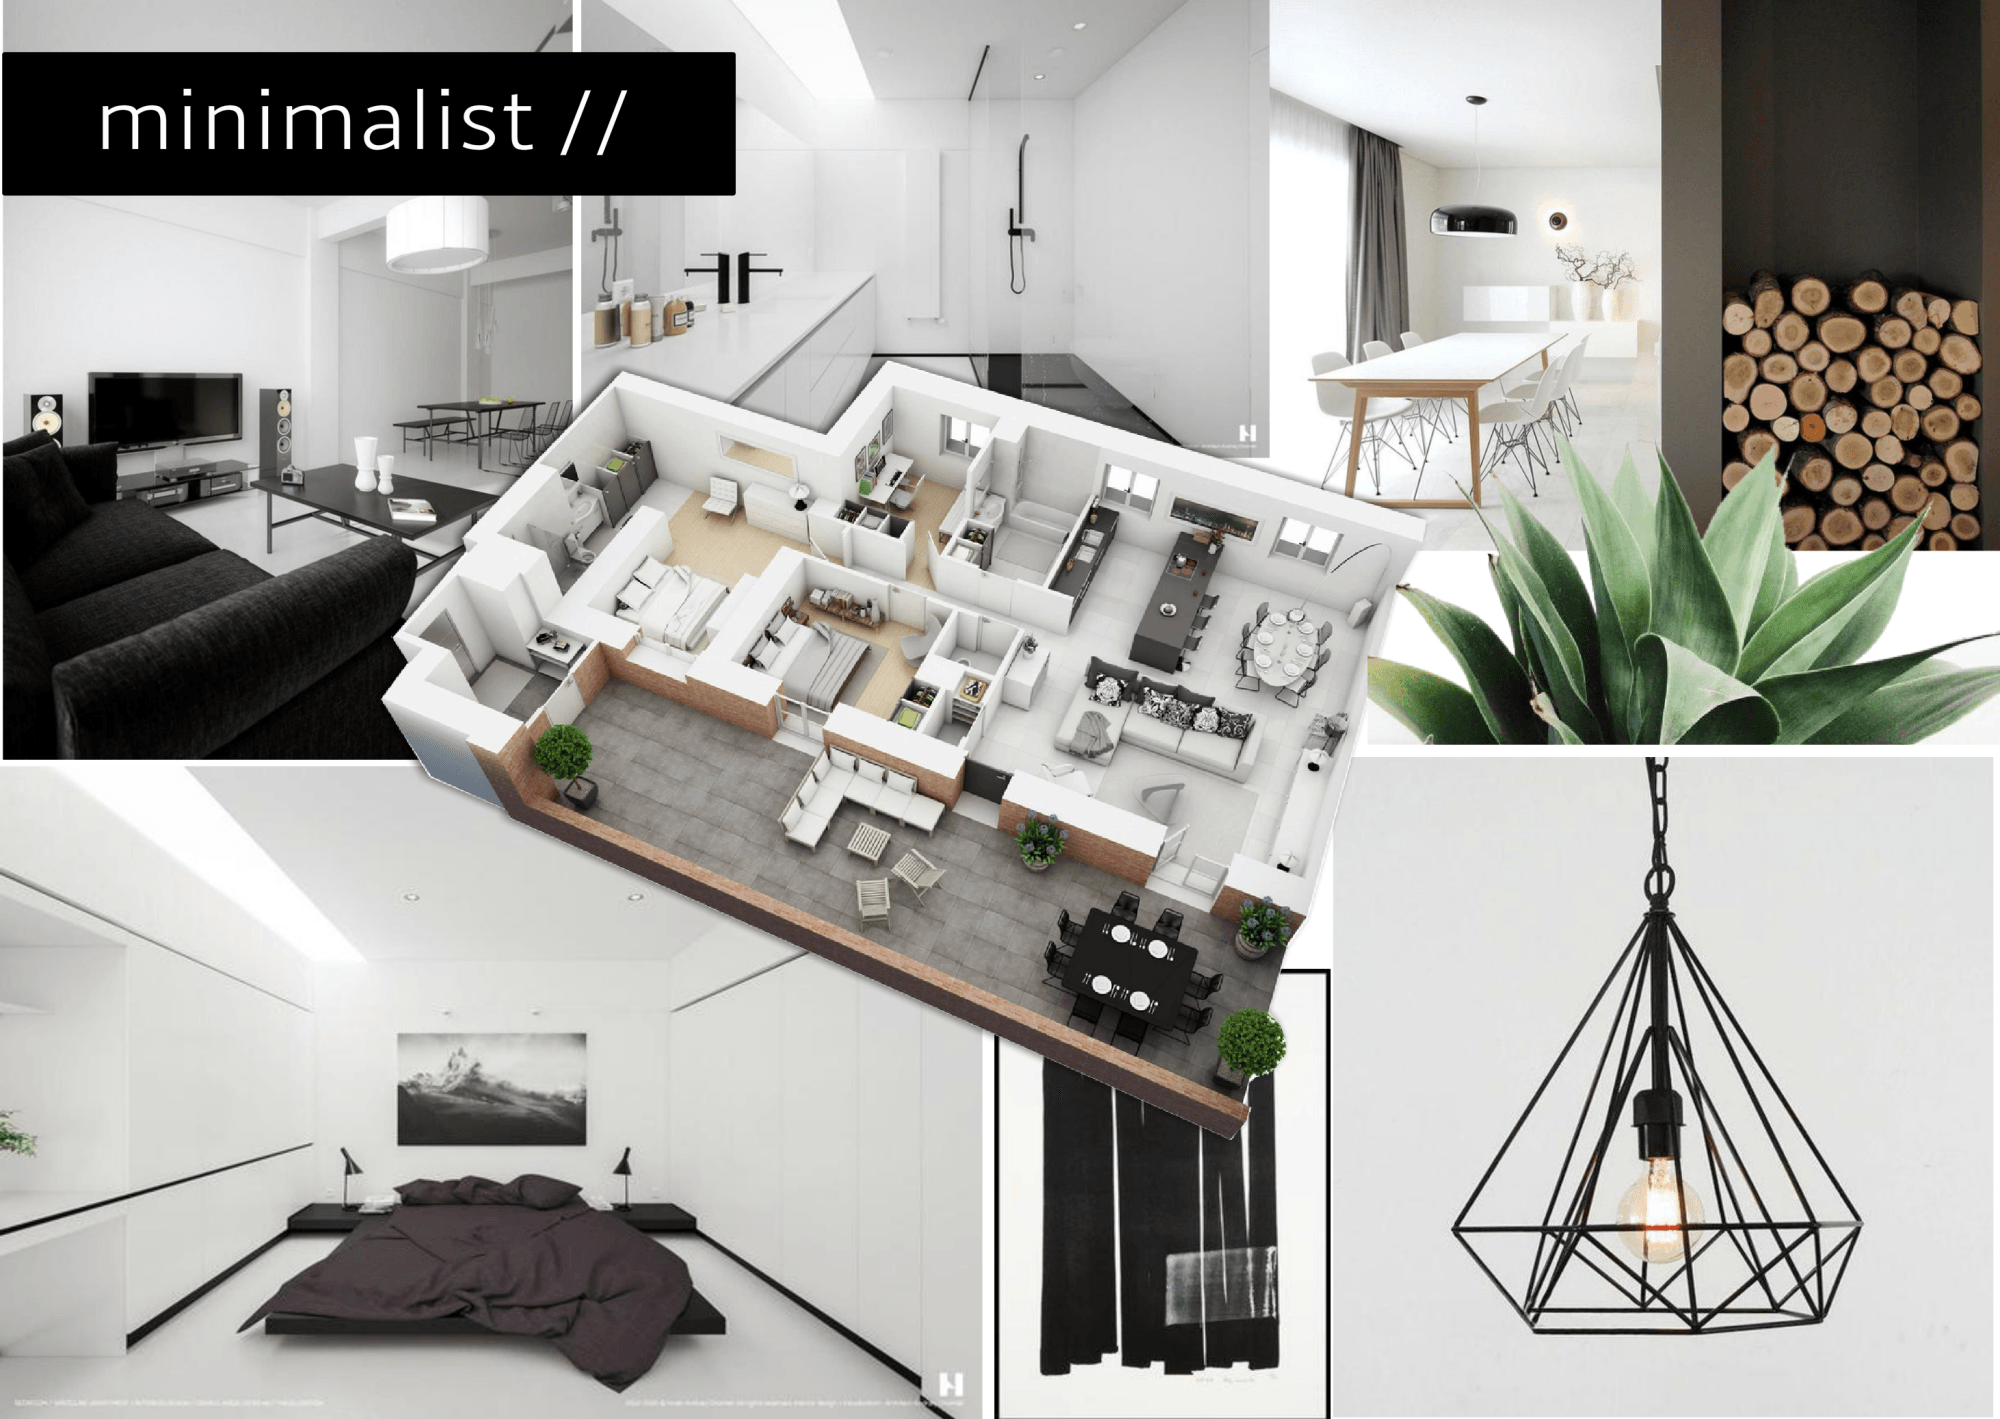 Minimalist Interior Design Moodboard Ebene Villa Pinterest Minimalist Interior Minimalist